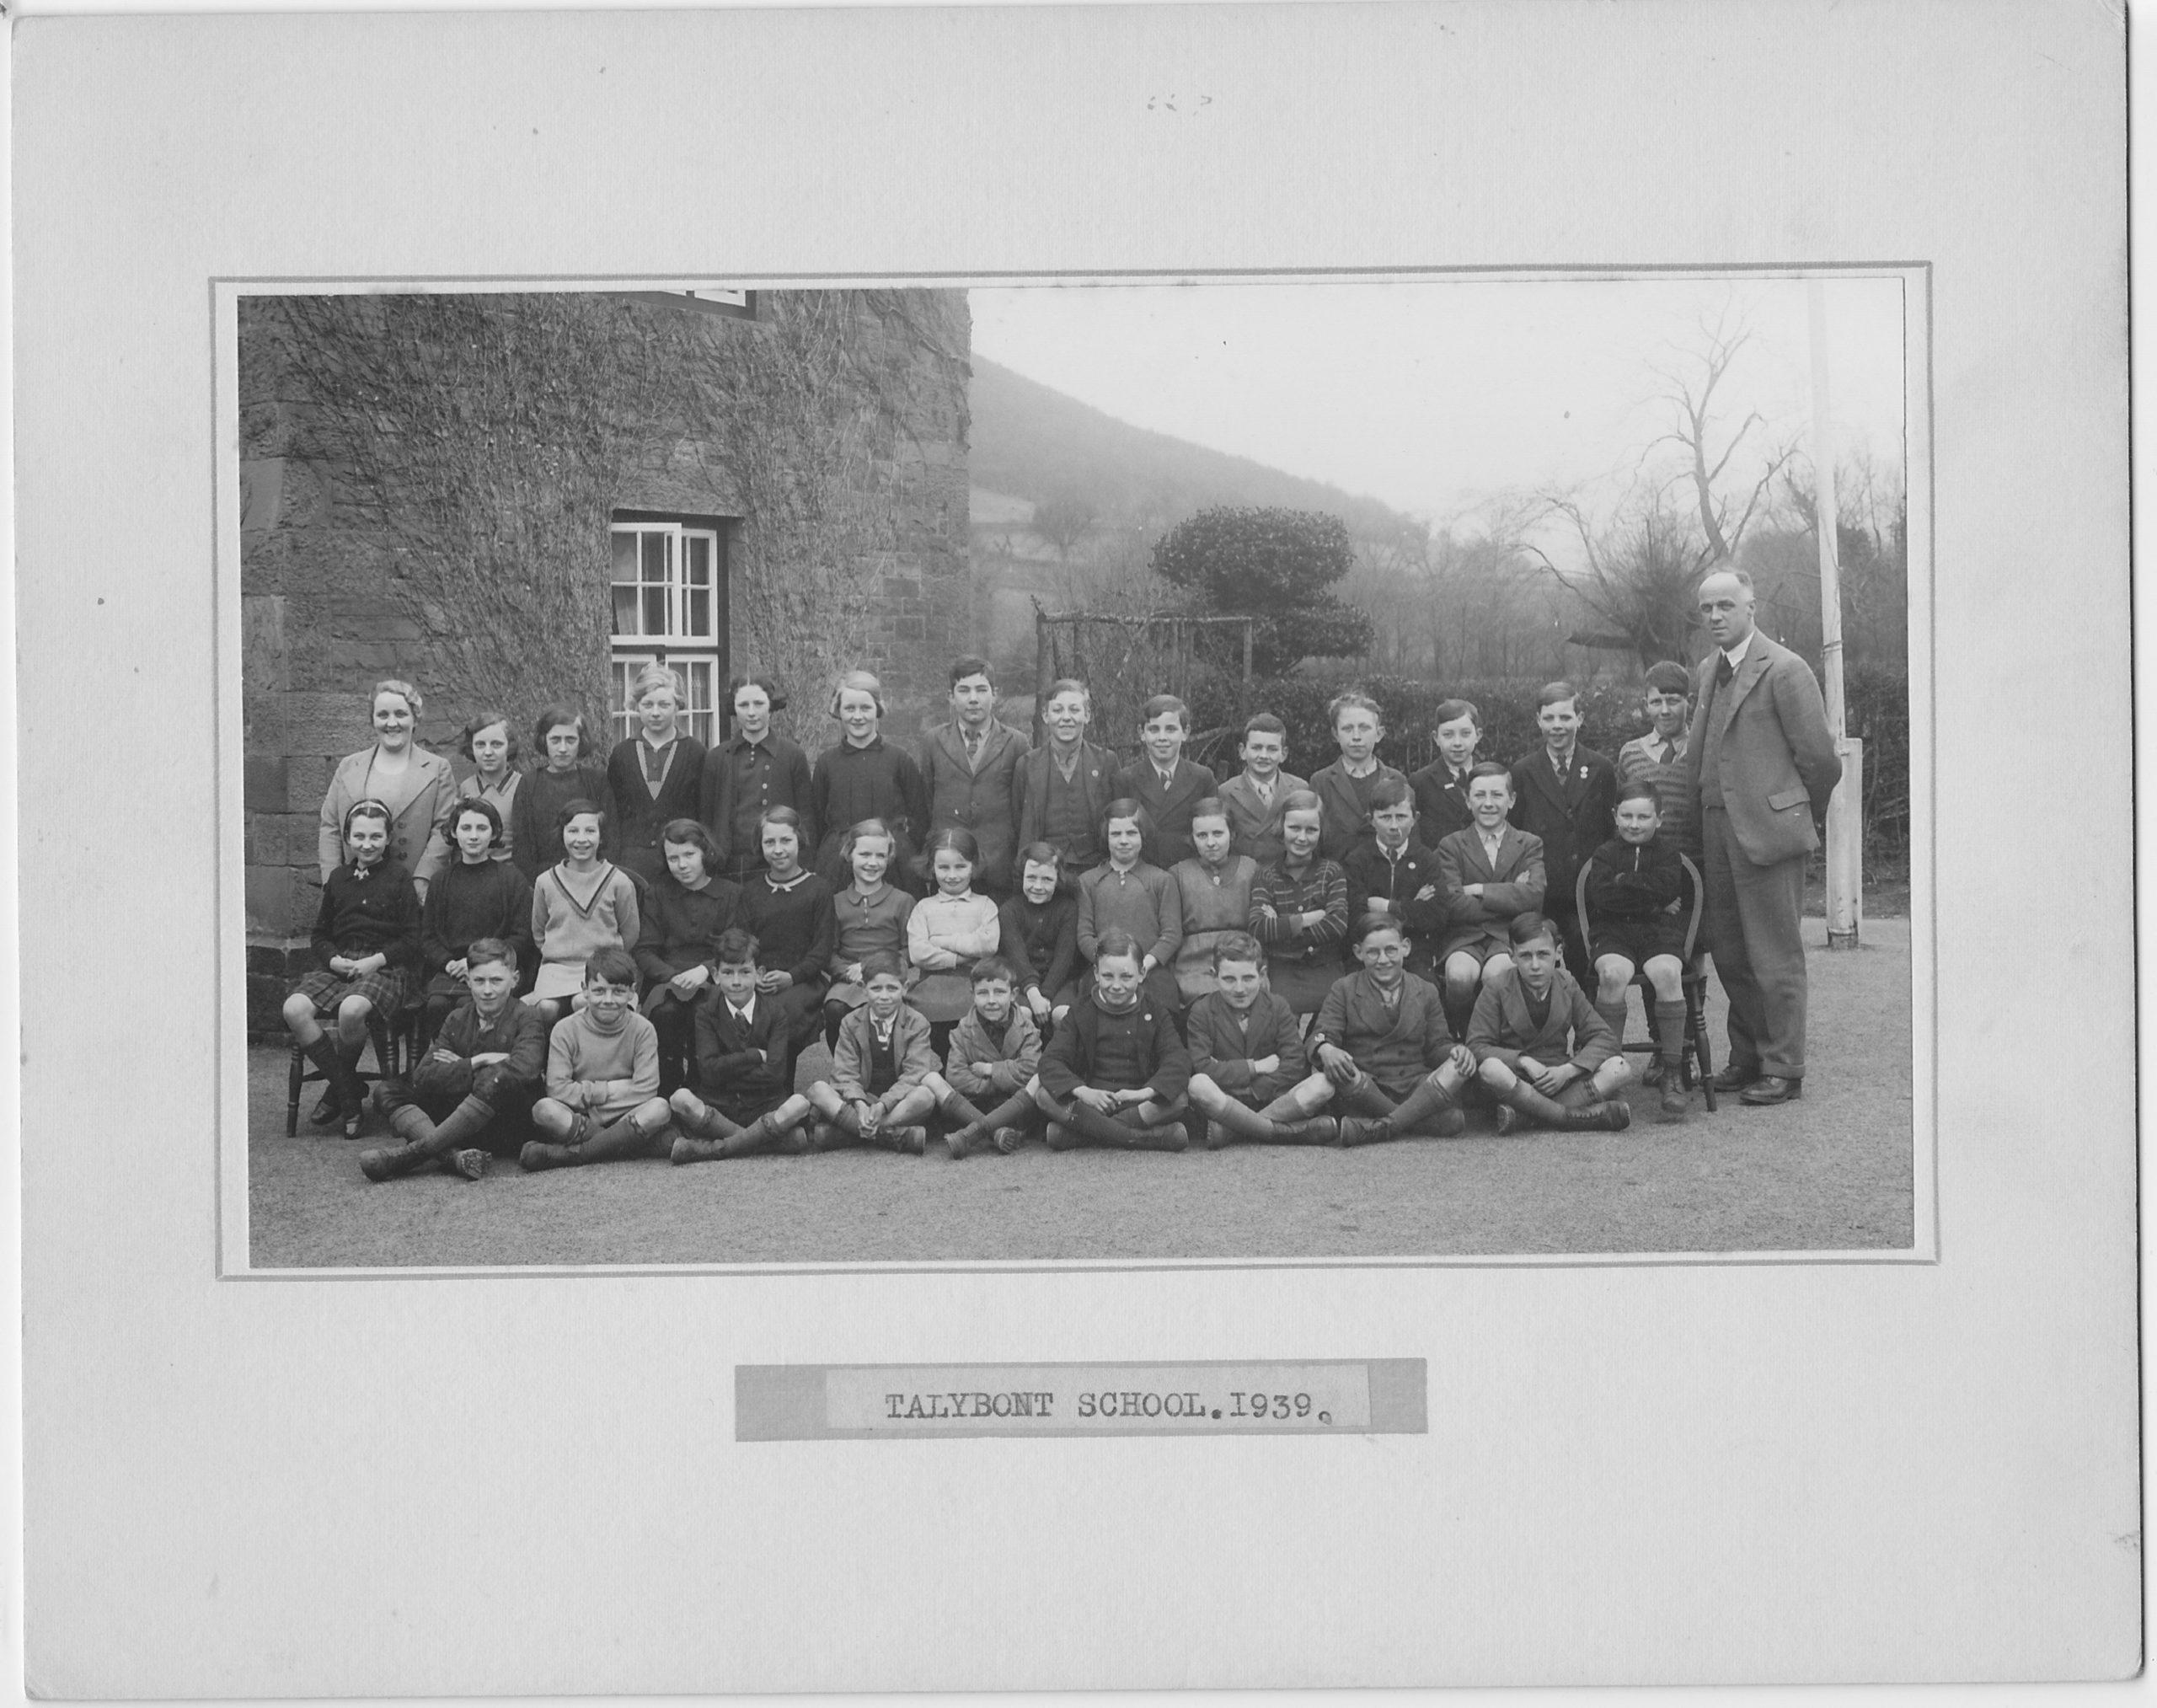 Talybont School 1939